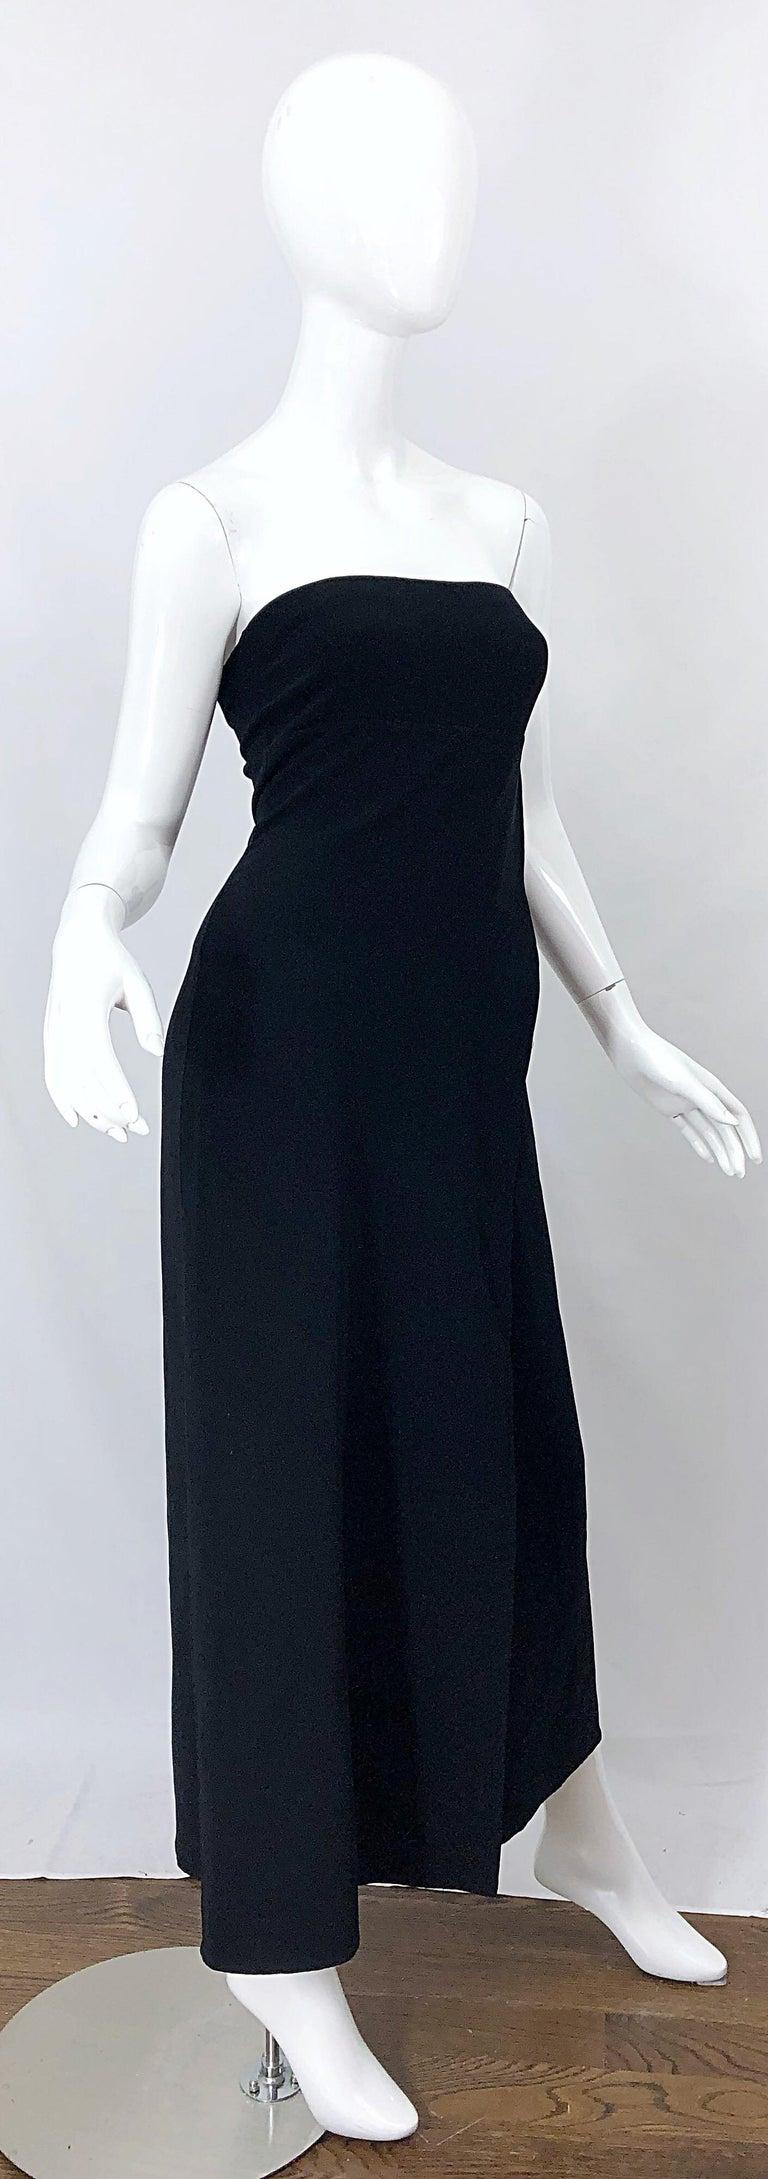 1990s Donna Karan New York Size 4 Black Strapless Vintage 90s Gown Maxi Dress For Sale 5